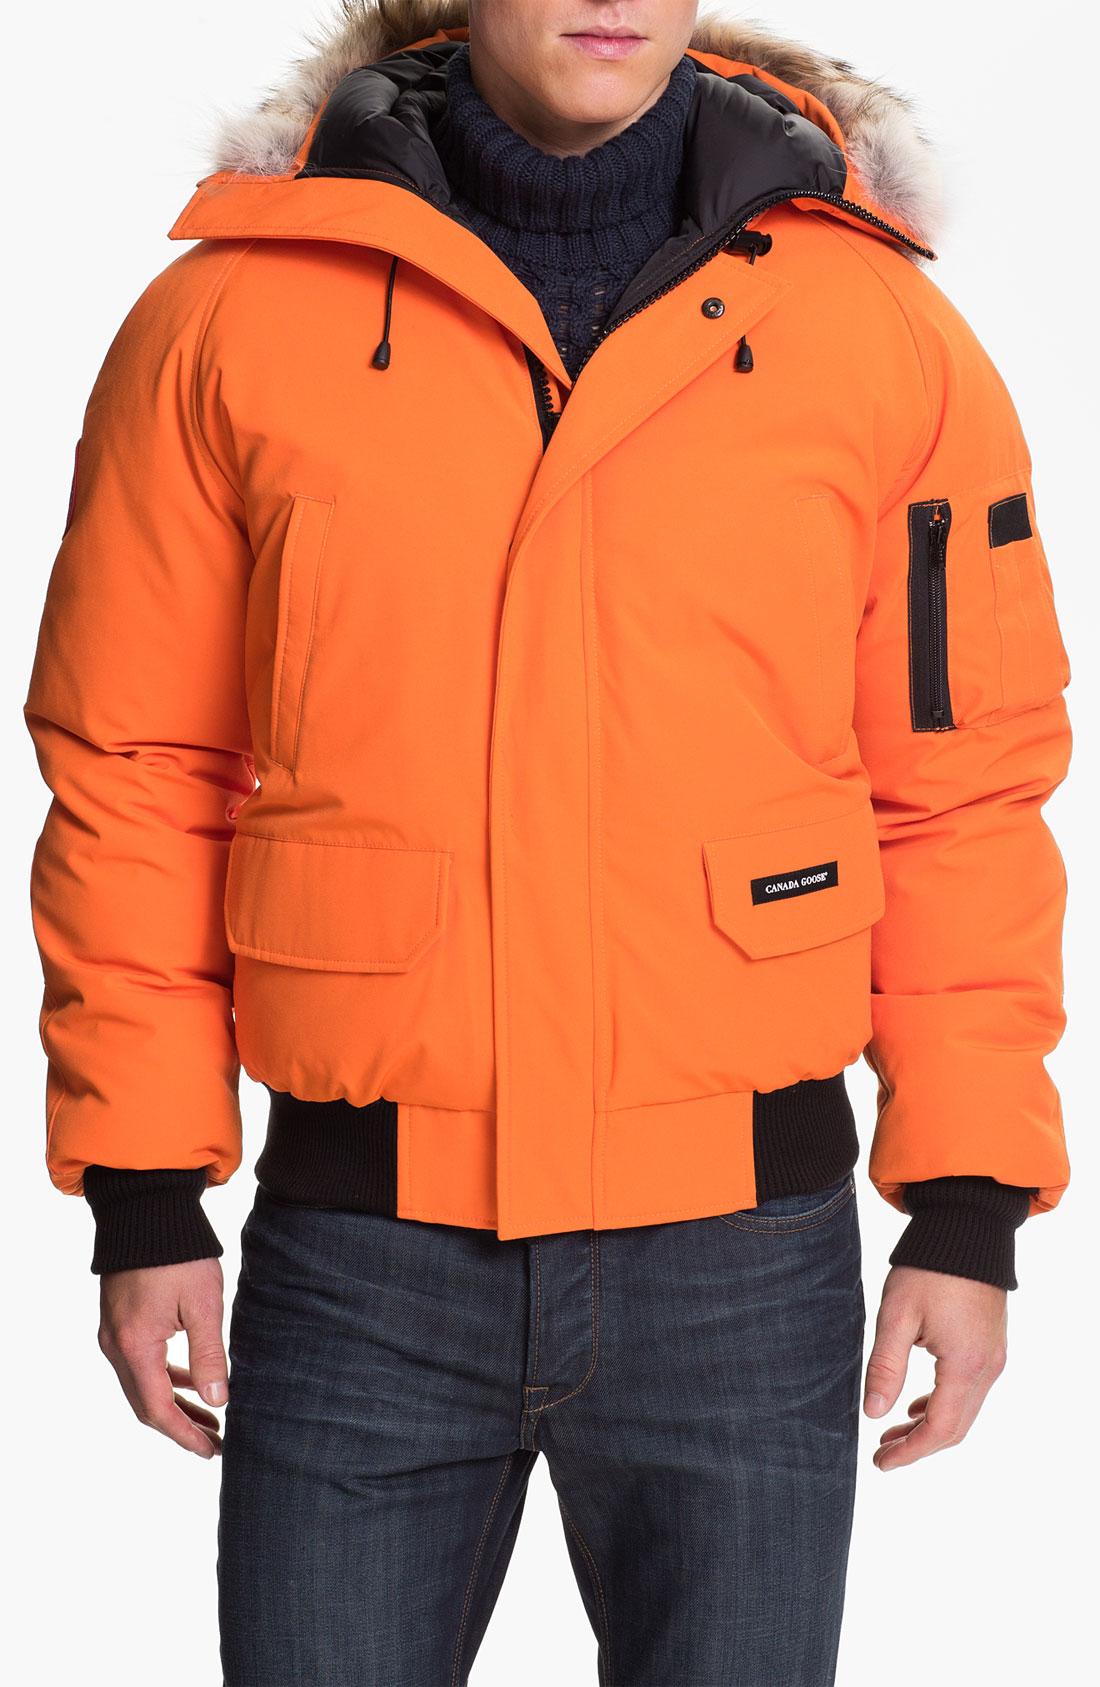 canada goose chilliwack down bomber jacket with genuine coyote trim in orange for men lyst. Black Bedroom Furniture Sets. Home Design Ideas